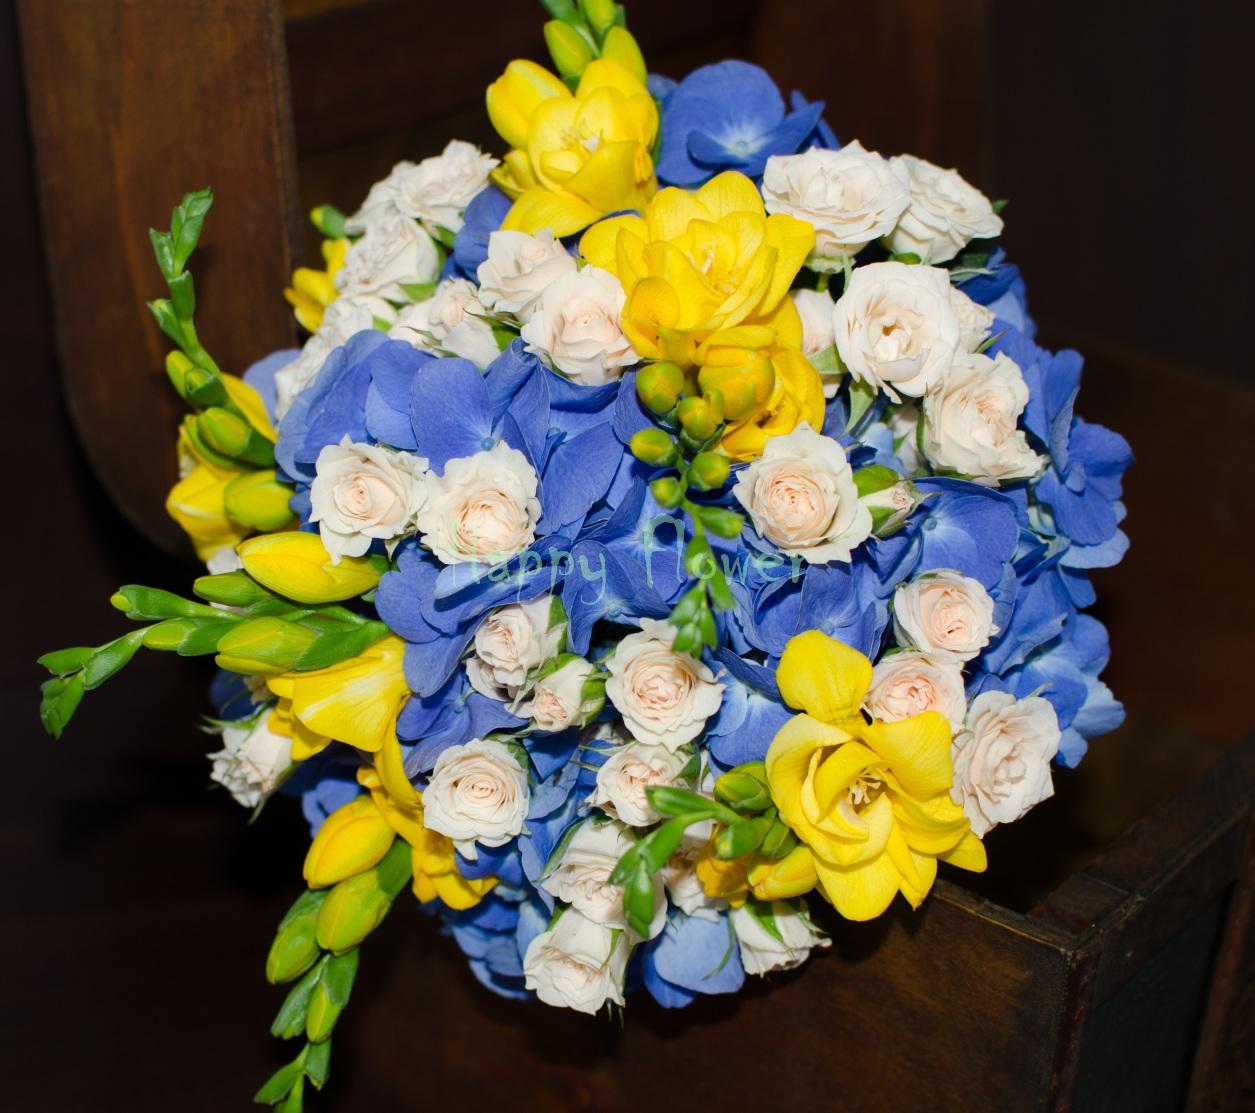 Buchet De Mireasă Din Hortensii Miniroze și Frezii Happy Flower